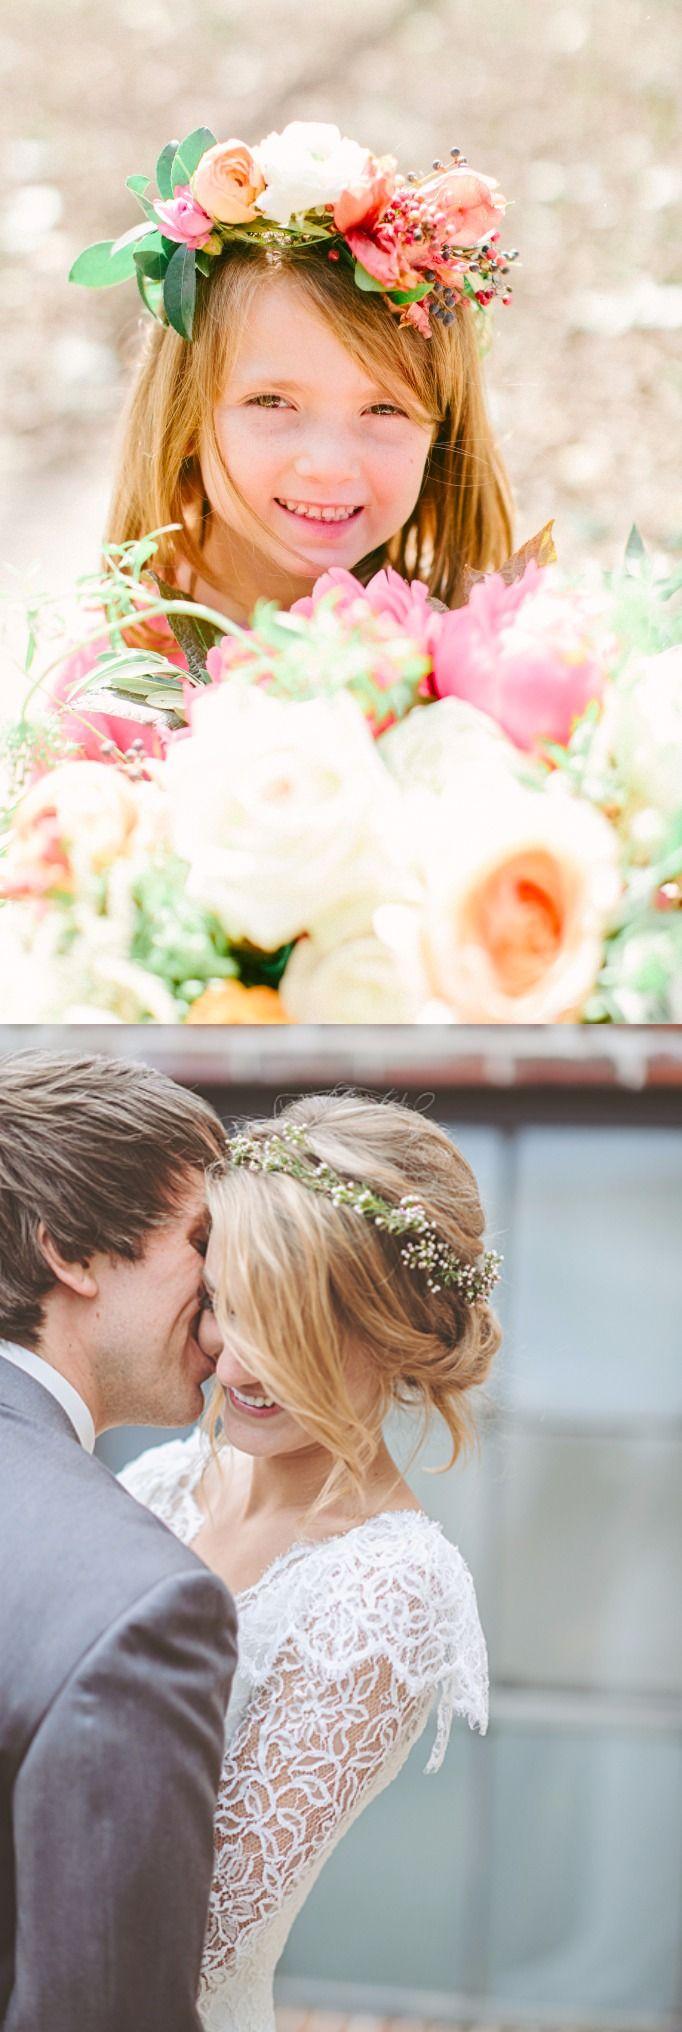 10 lindas coronas de flores para el cabello / http://www.intimateweddings.com/